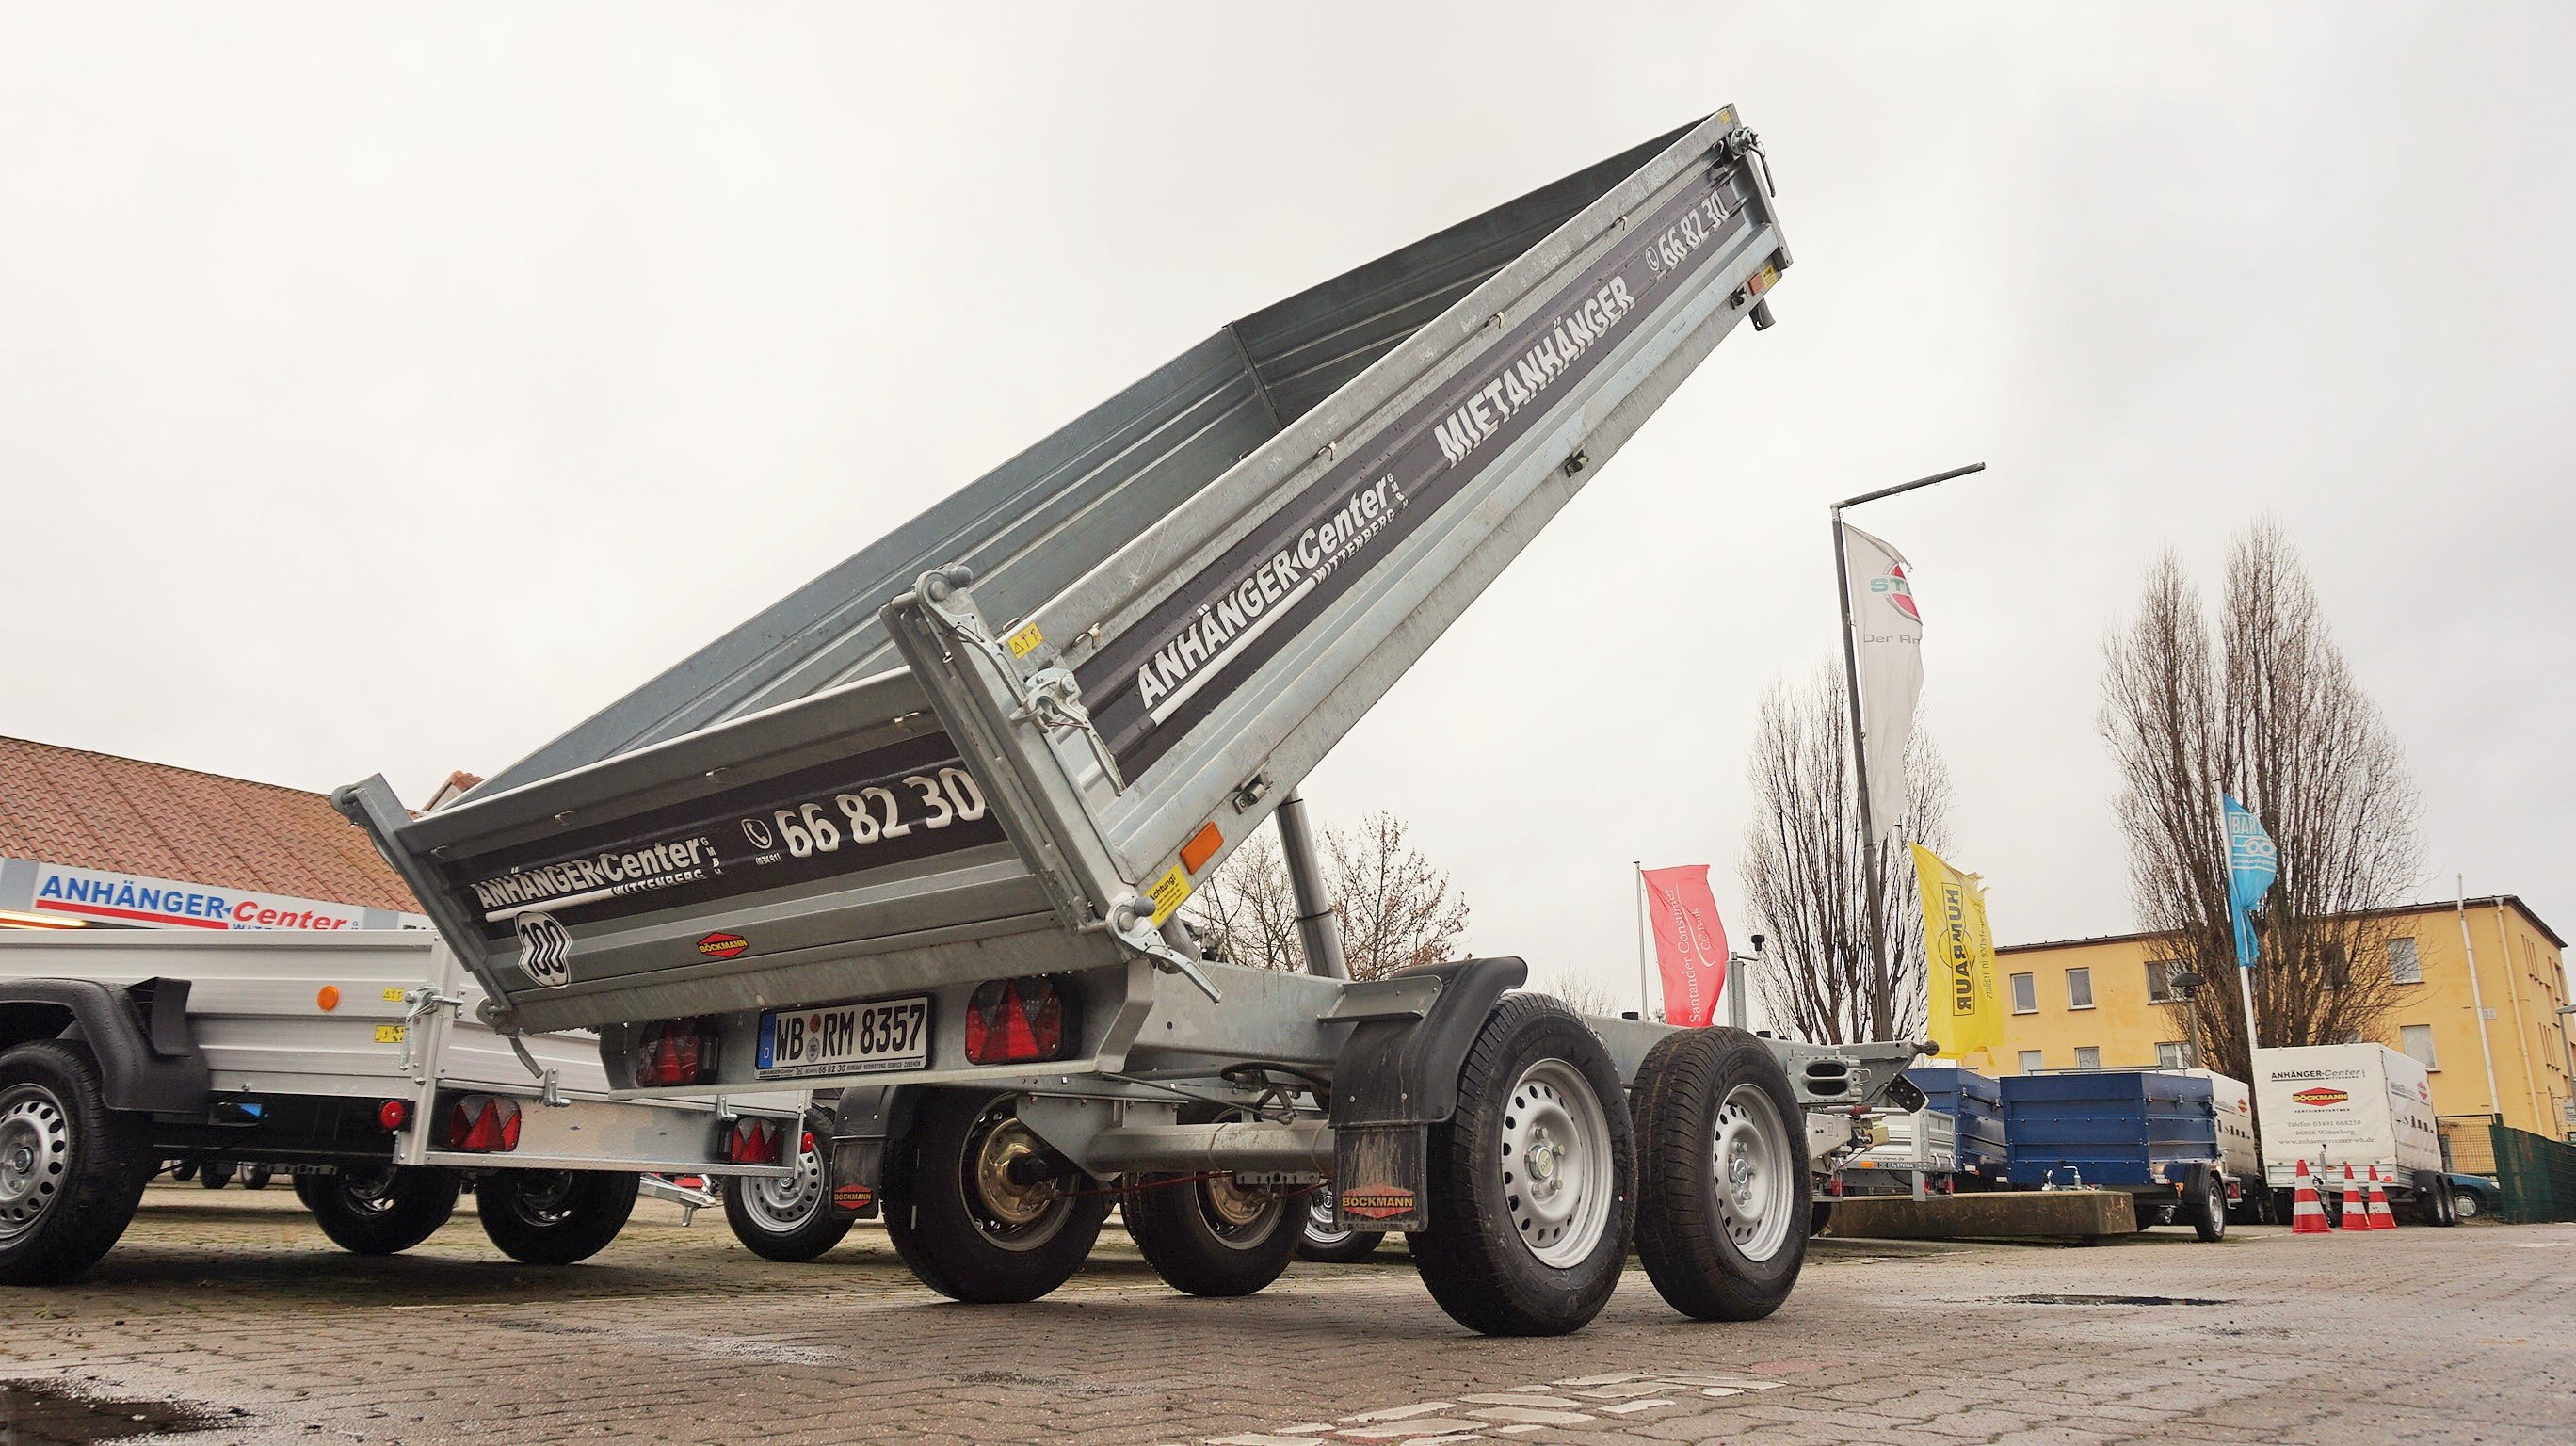 Anhänger Mieten Sixt : universaltransport anh nger 3500 kg hier sofort mieten ~ Watch28wear.com Haus und Dekorationen